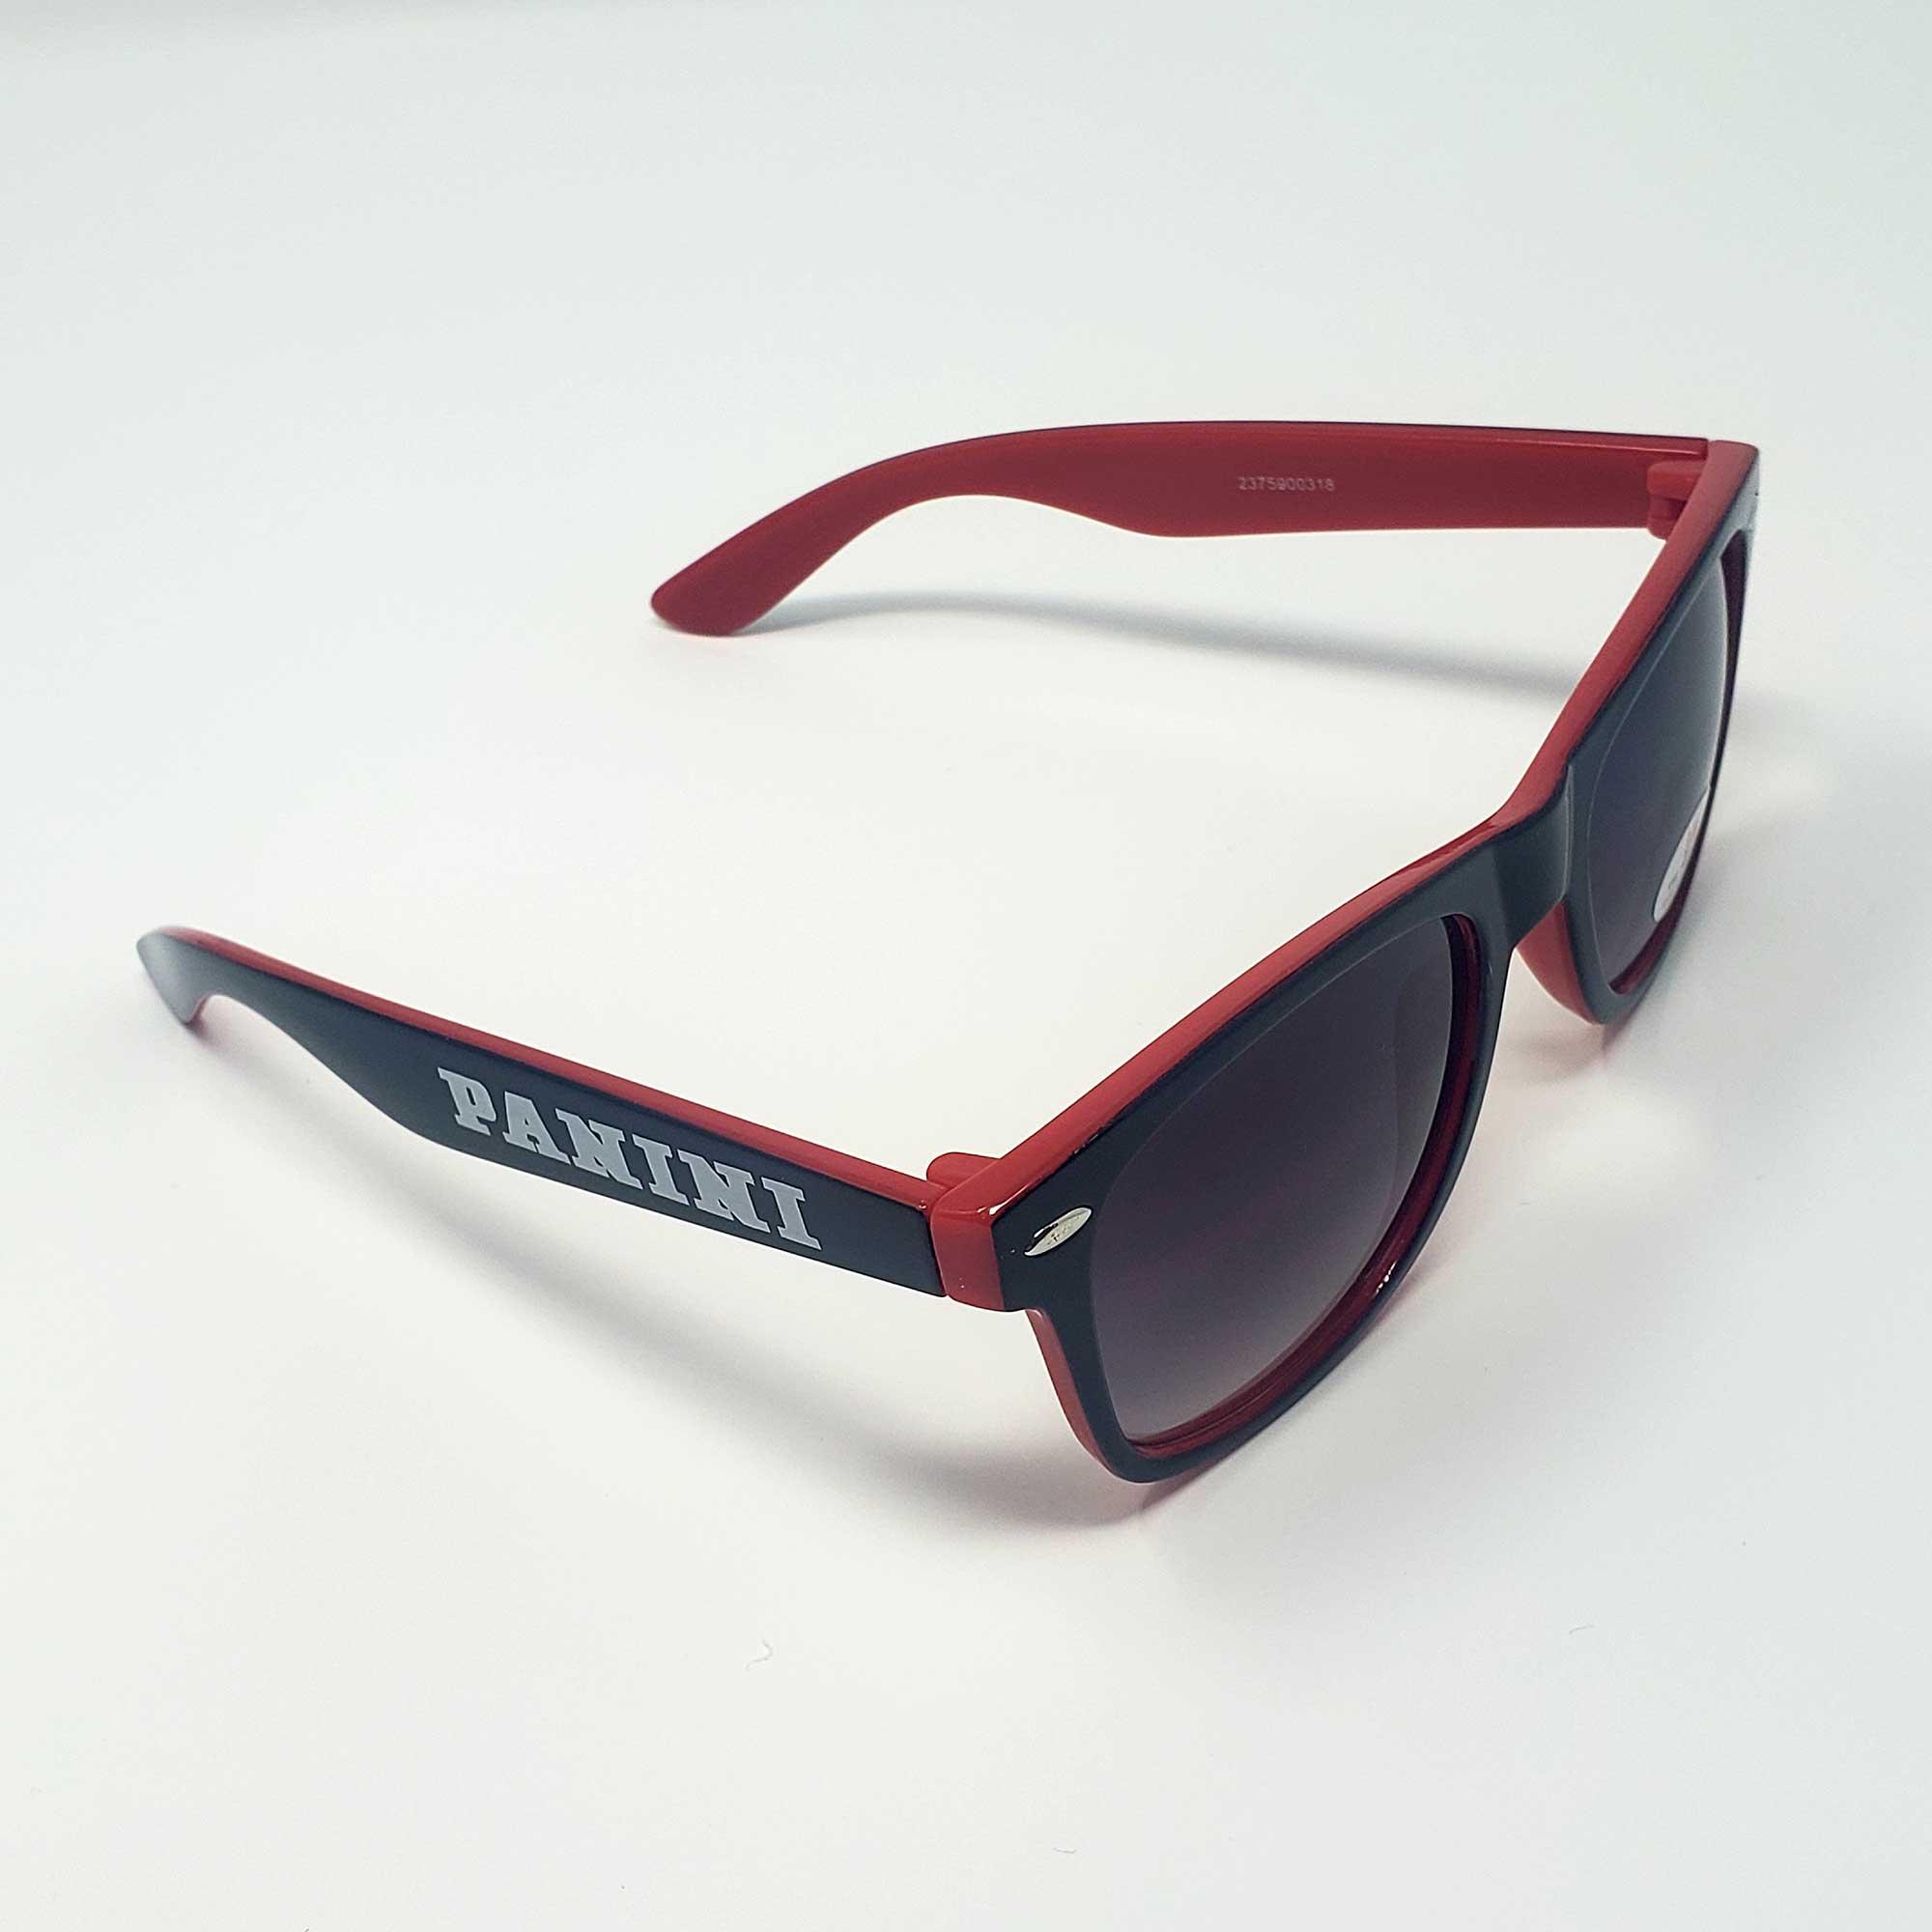 Red & Black Panini Sunglasses